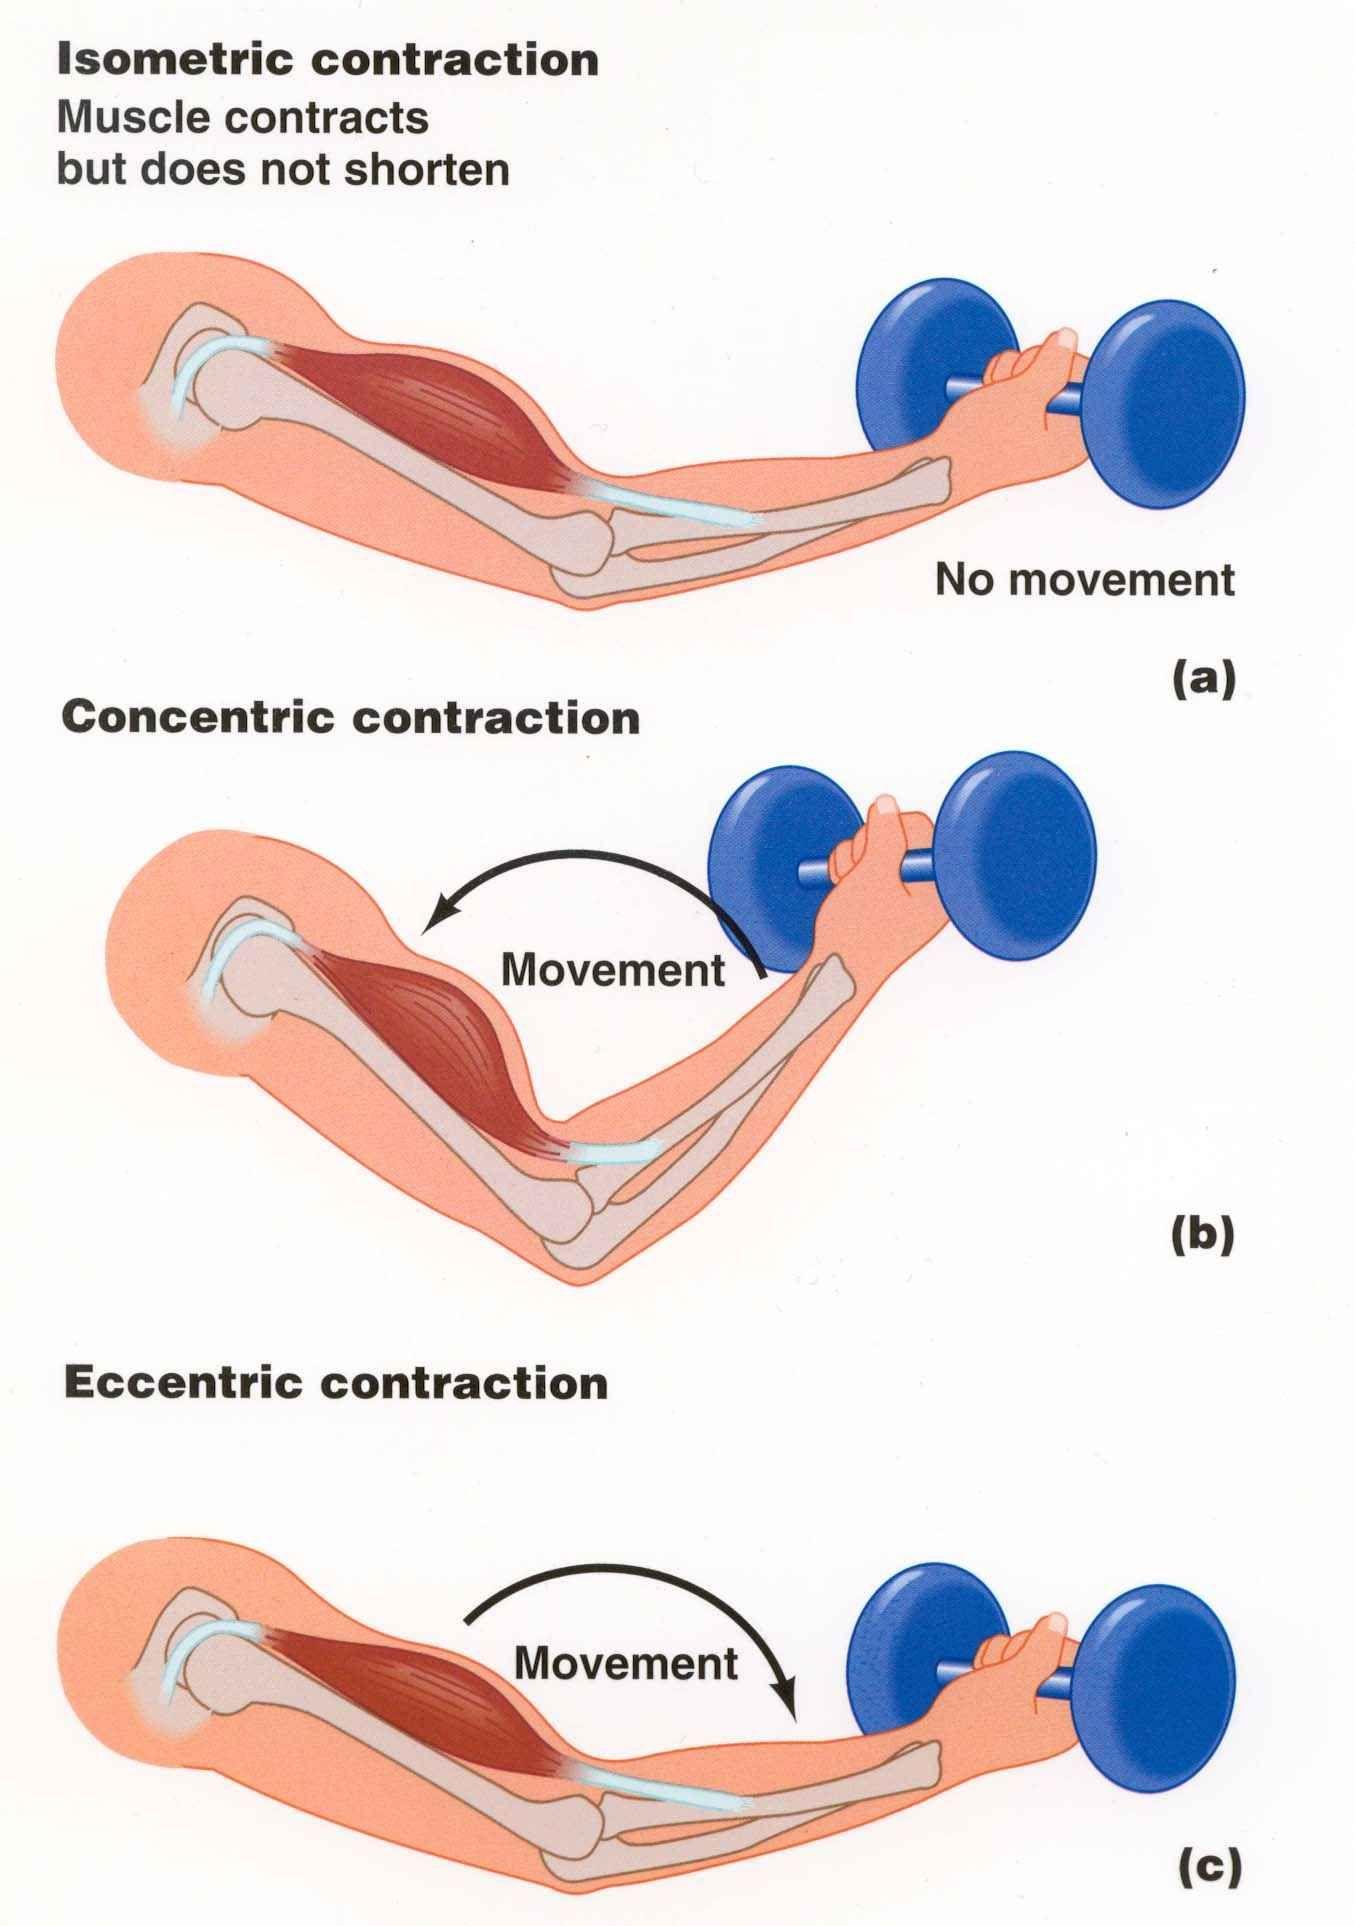 asics femme vertebral column diagram with muscles